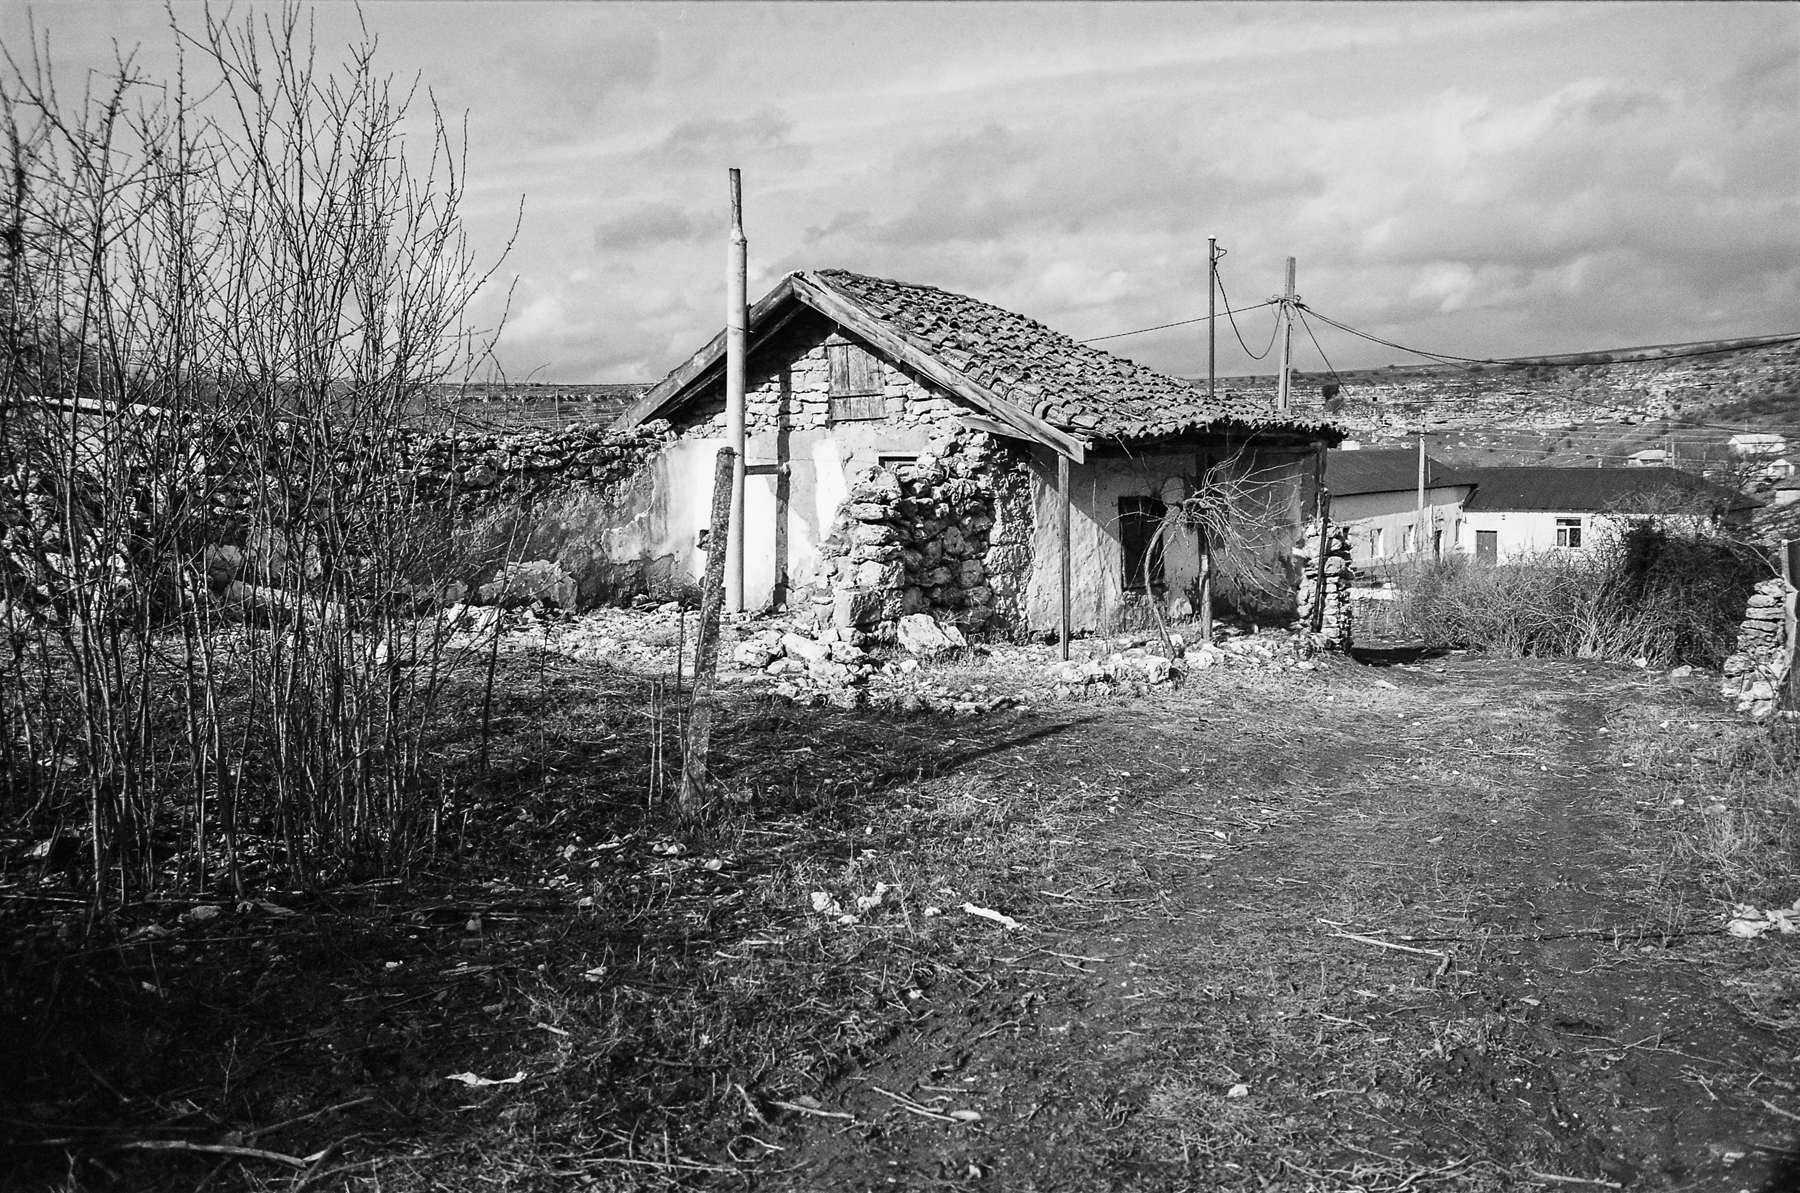 Marian Tudor | A Turkish Village In Romania | Nikon FM2n Voigtlander Color Skopar 28mm f2.8